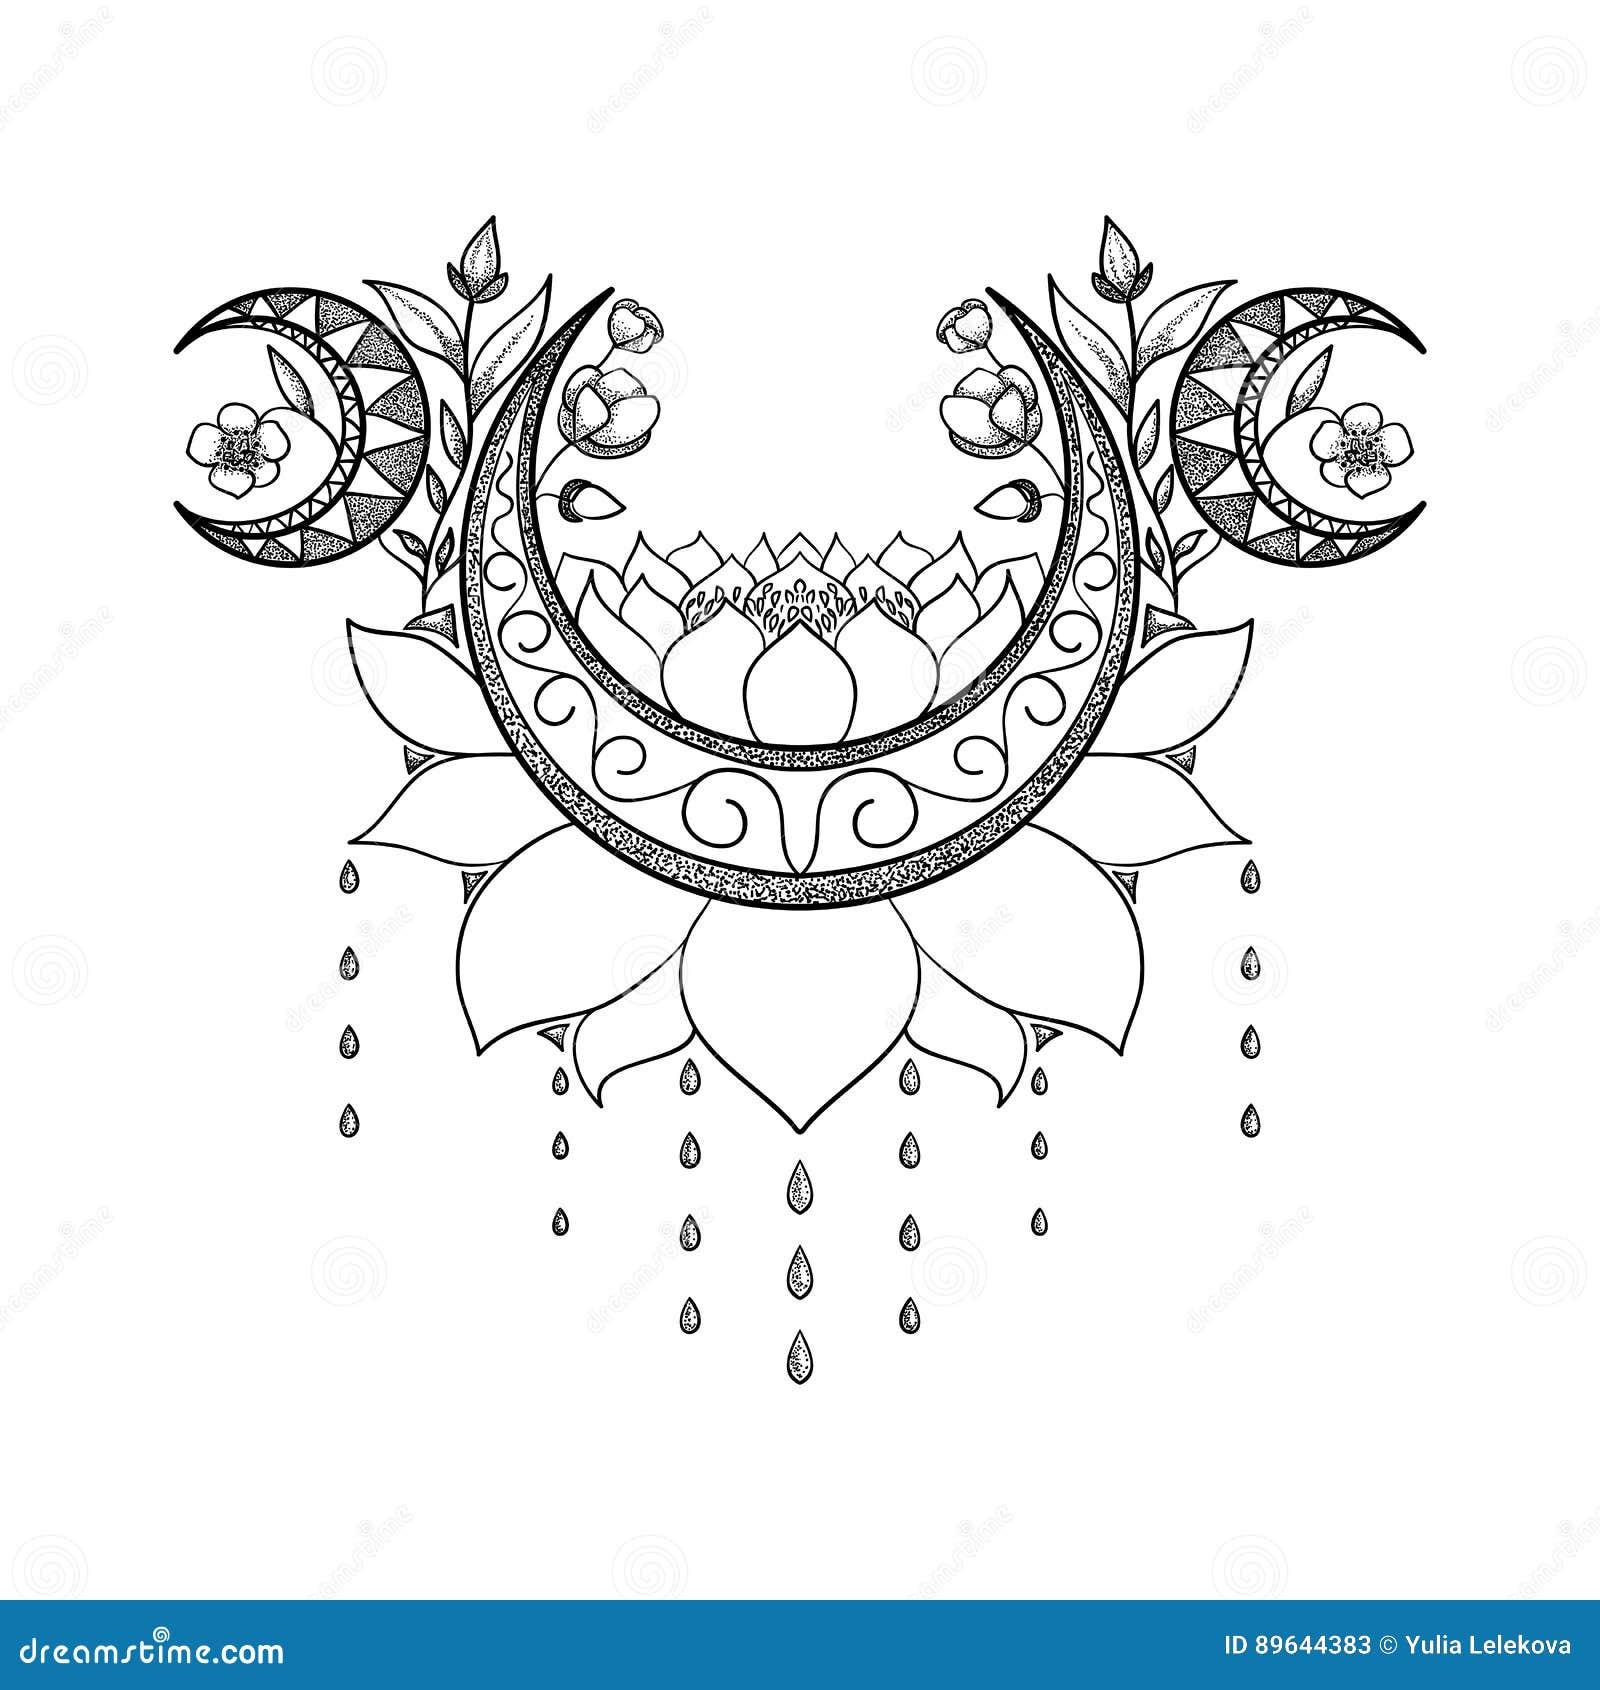 Vector hand drawn tattoo design crescent moon lotus and flowers vector hand drawn tattoo design crescent moon lotus and flowers composition sacred theme izmirmasajfo